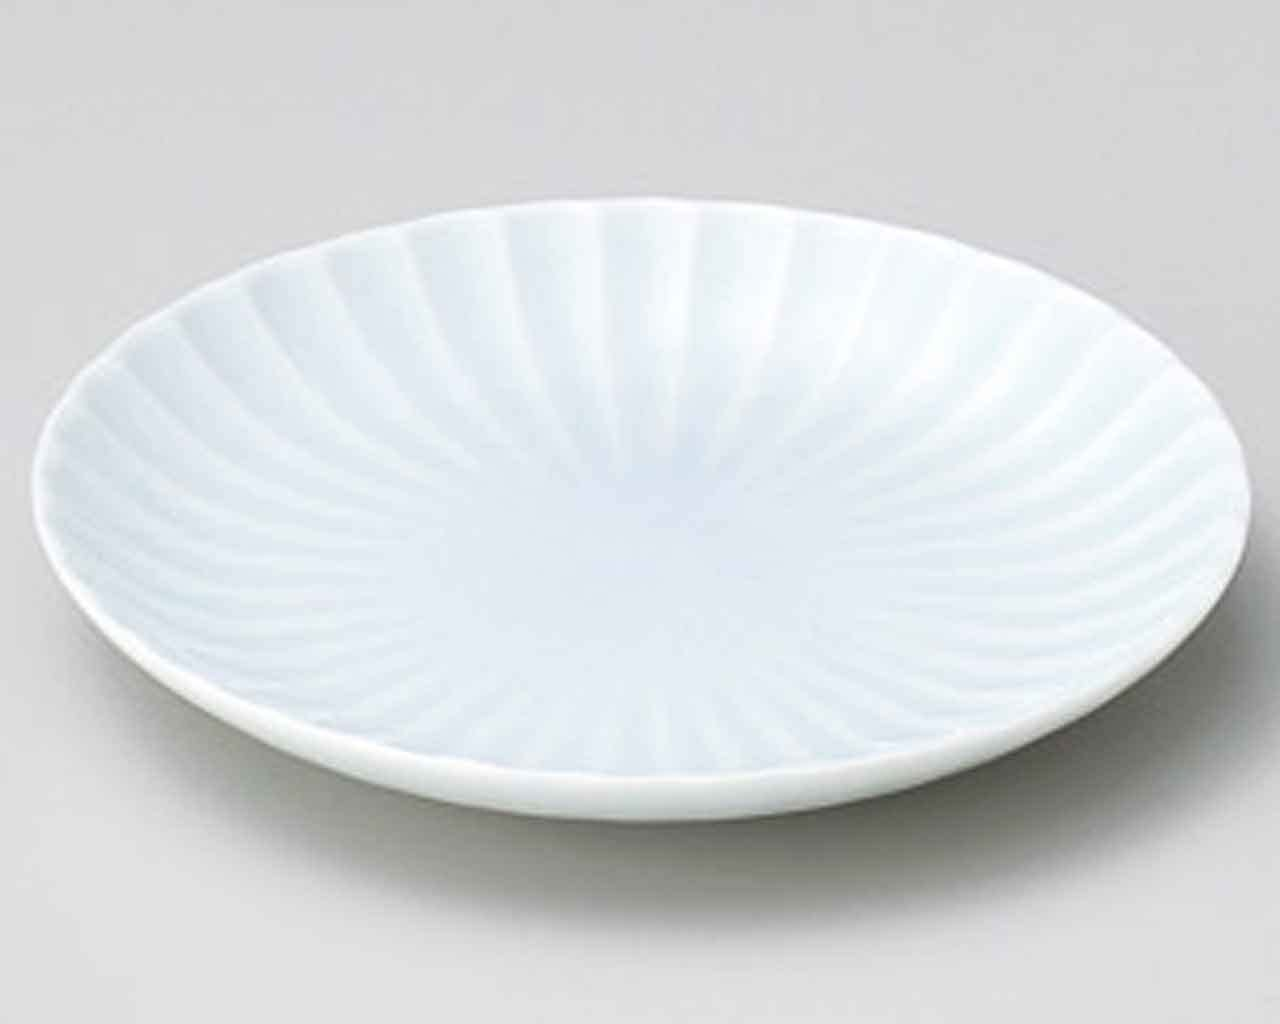 Kasumi Seihakuji 4.9inch Set of 2 Small Plates Blue porcelain Made in Japan